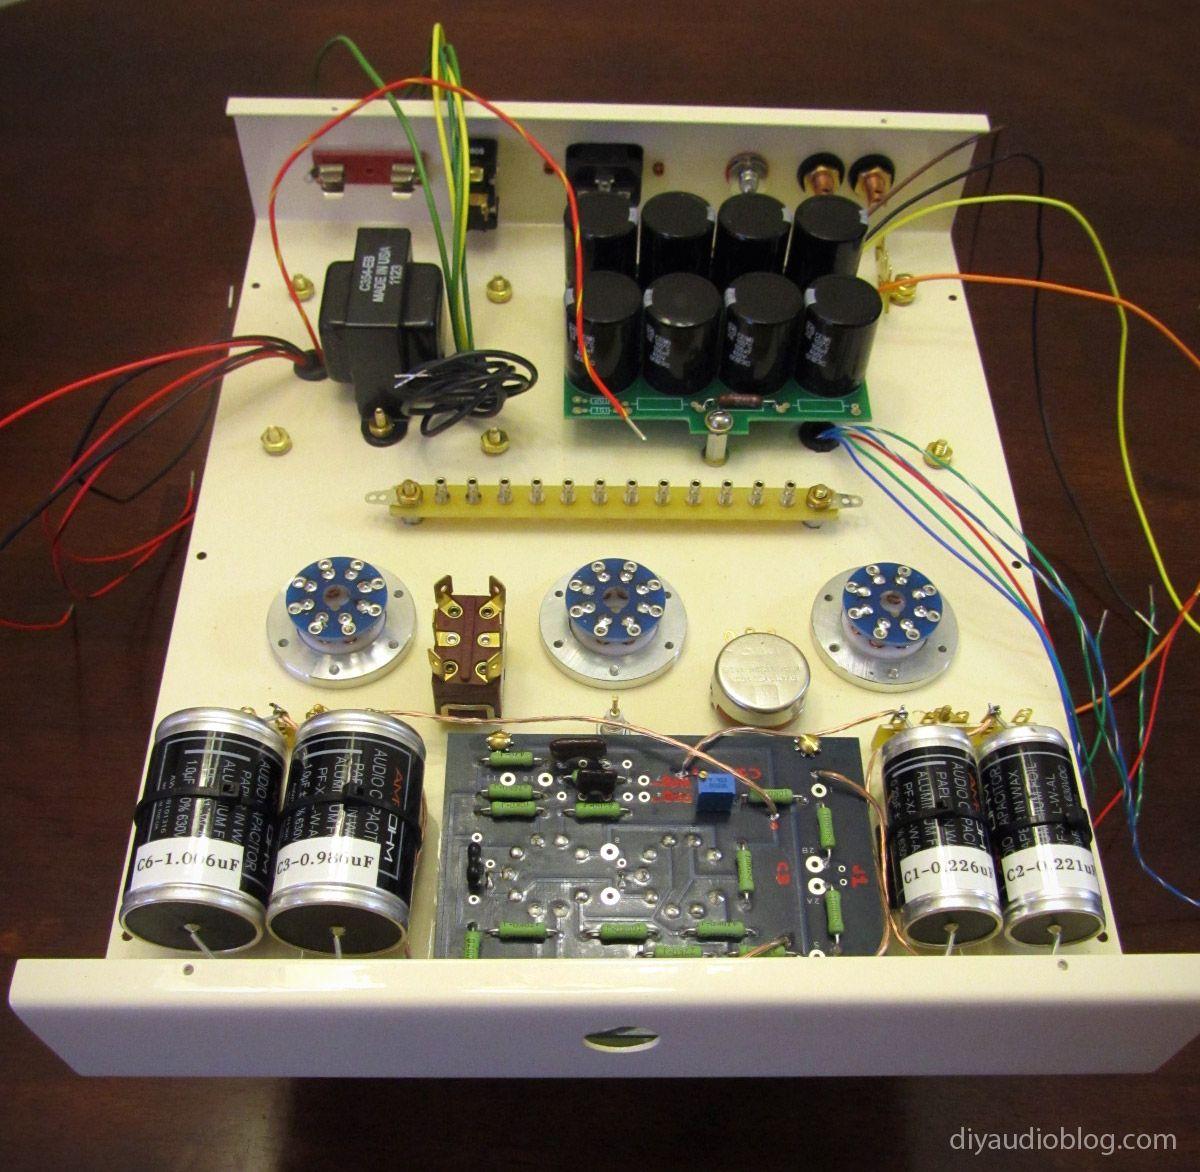 Audiophile Headphone Mods Diy Audio Cables Electronics 25w Classa Power Amplifier Circuit Diagram Supreem Circuits Including Chip Amps Gain